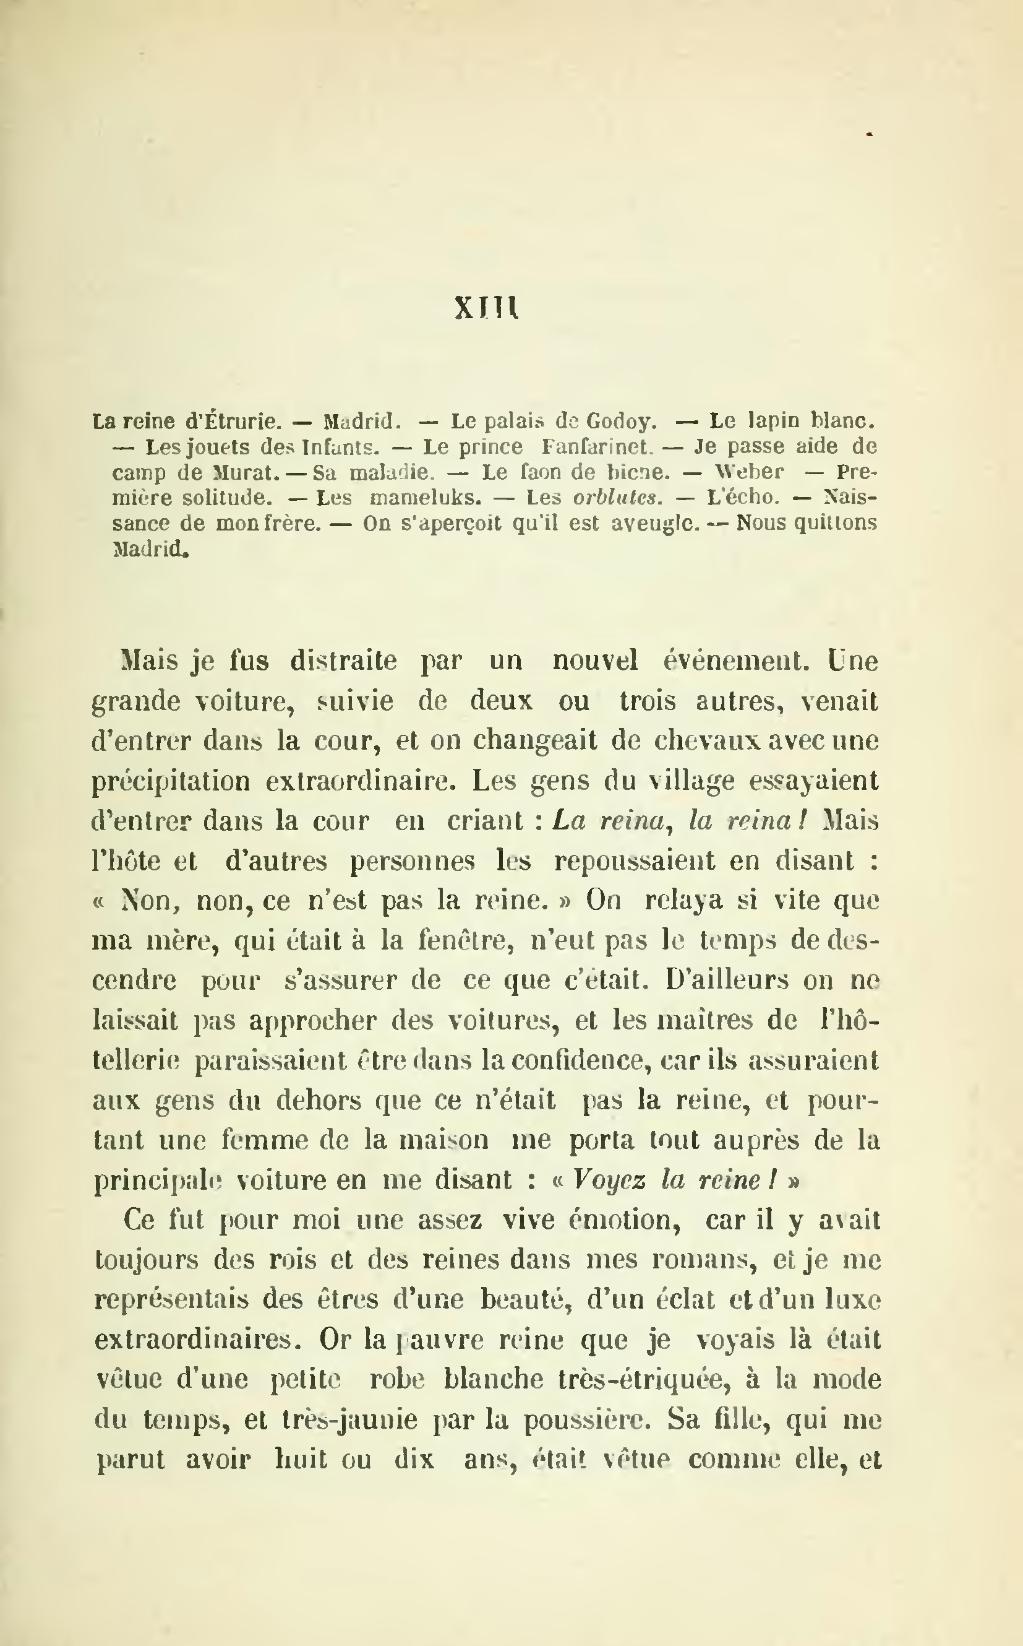 De Ma Histoire Vie Tome sand 2 djvu203 Wikisource Page lFcJK1